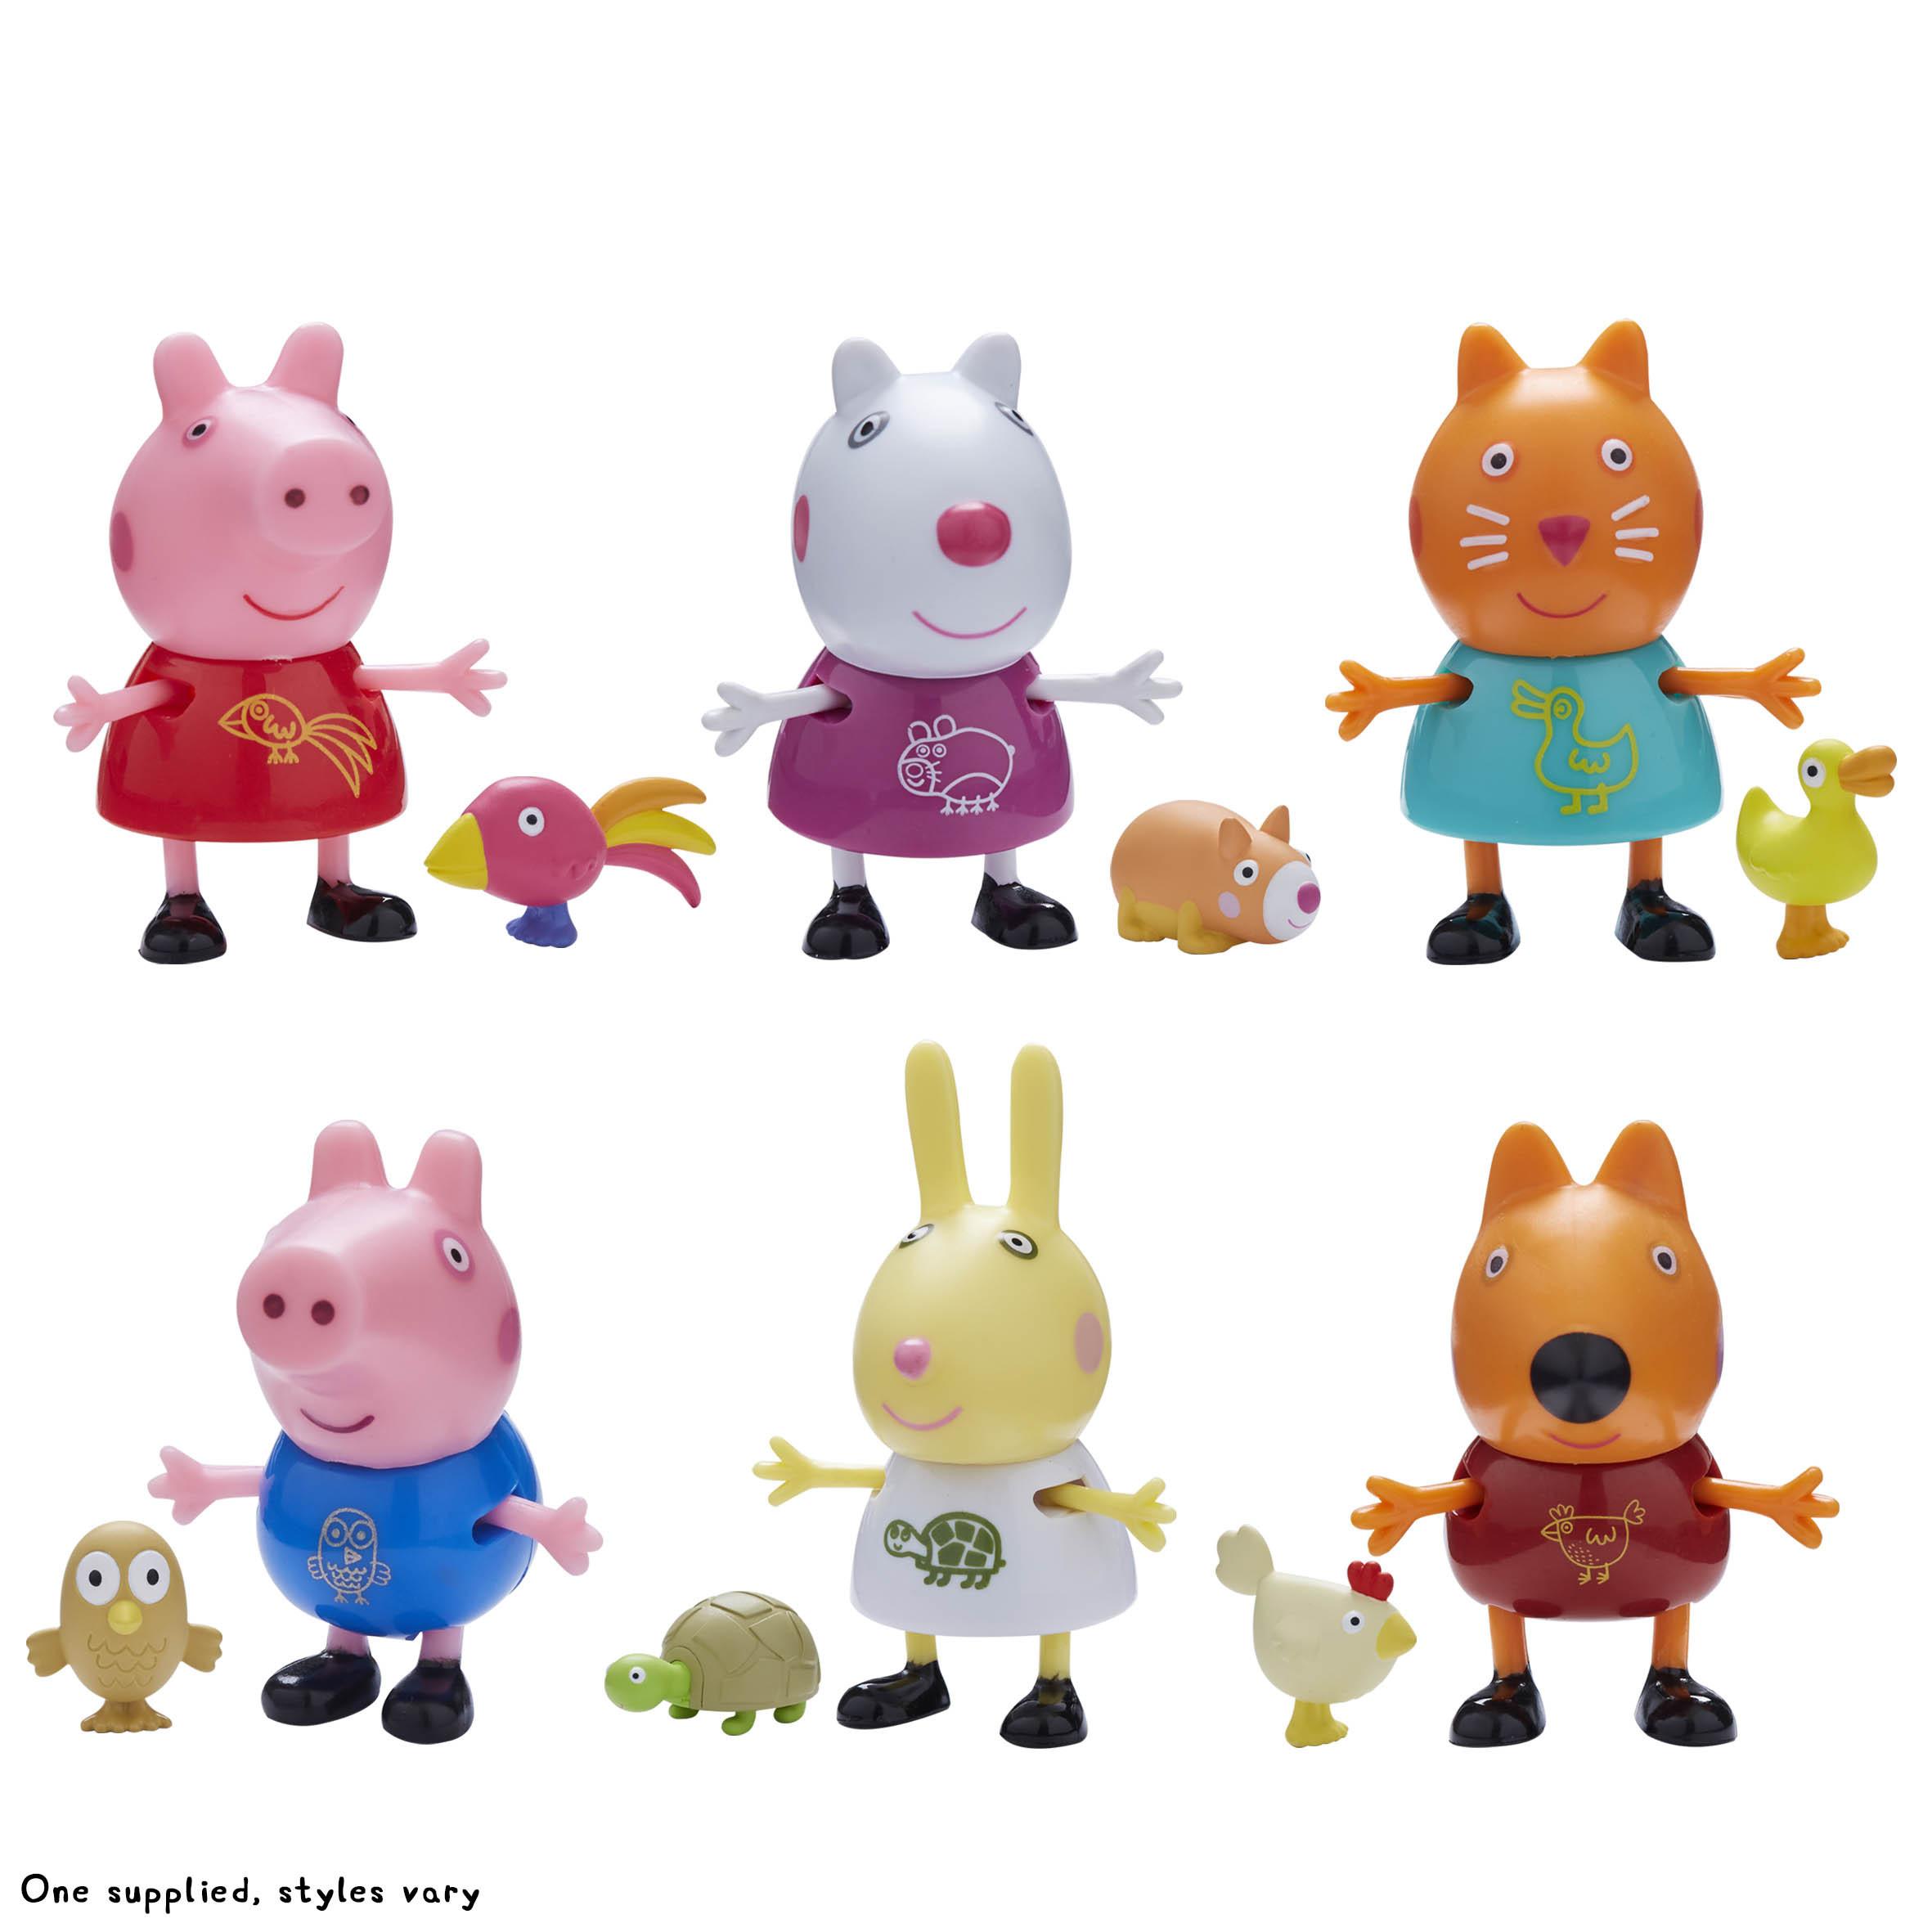 Peppa Pig Φιλαράκια & Ζωάκια Σετ 2 Φιγούρες - 6 Σχέδια (PPC44000)